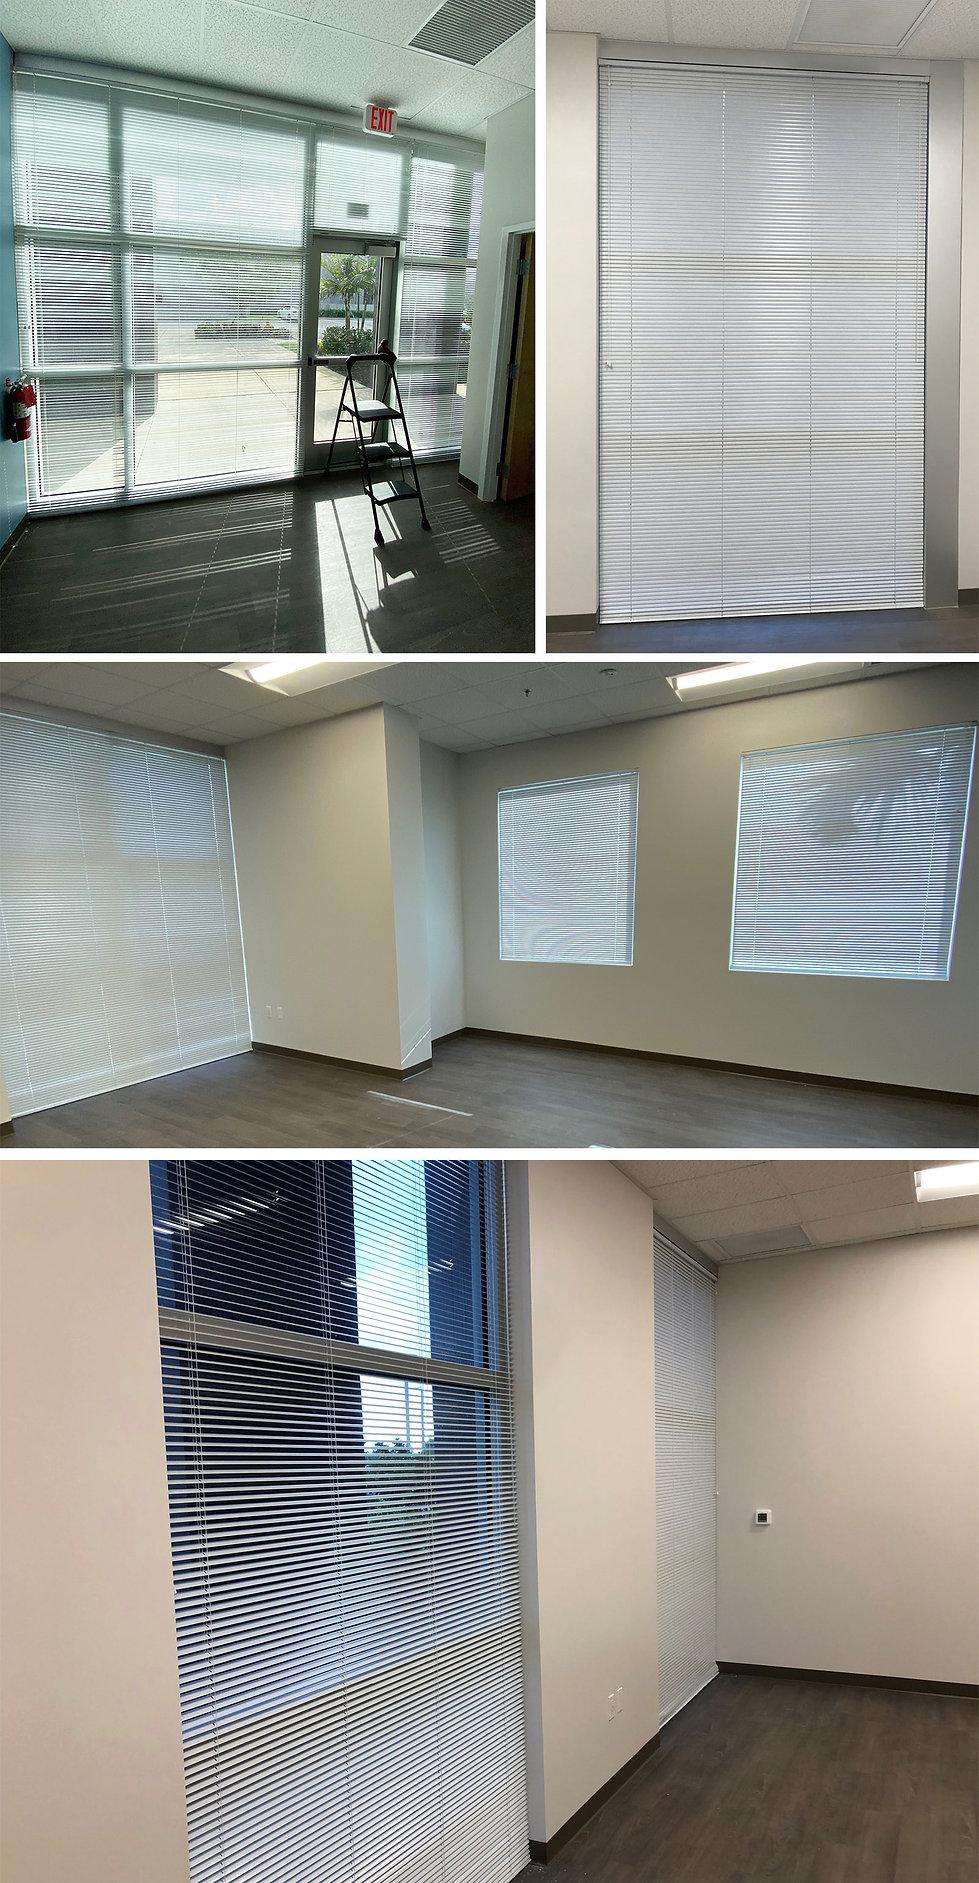 aluminum-mini-blinds-commercial-window-s